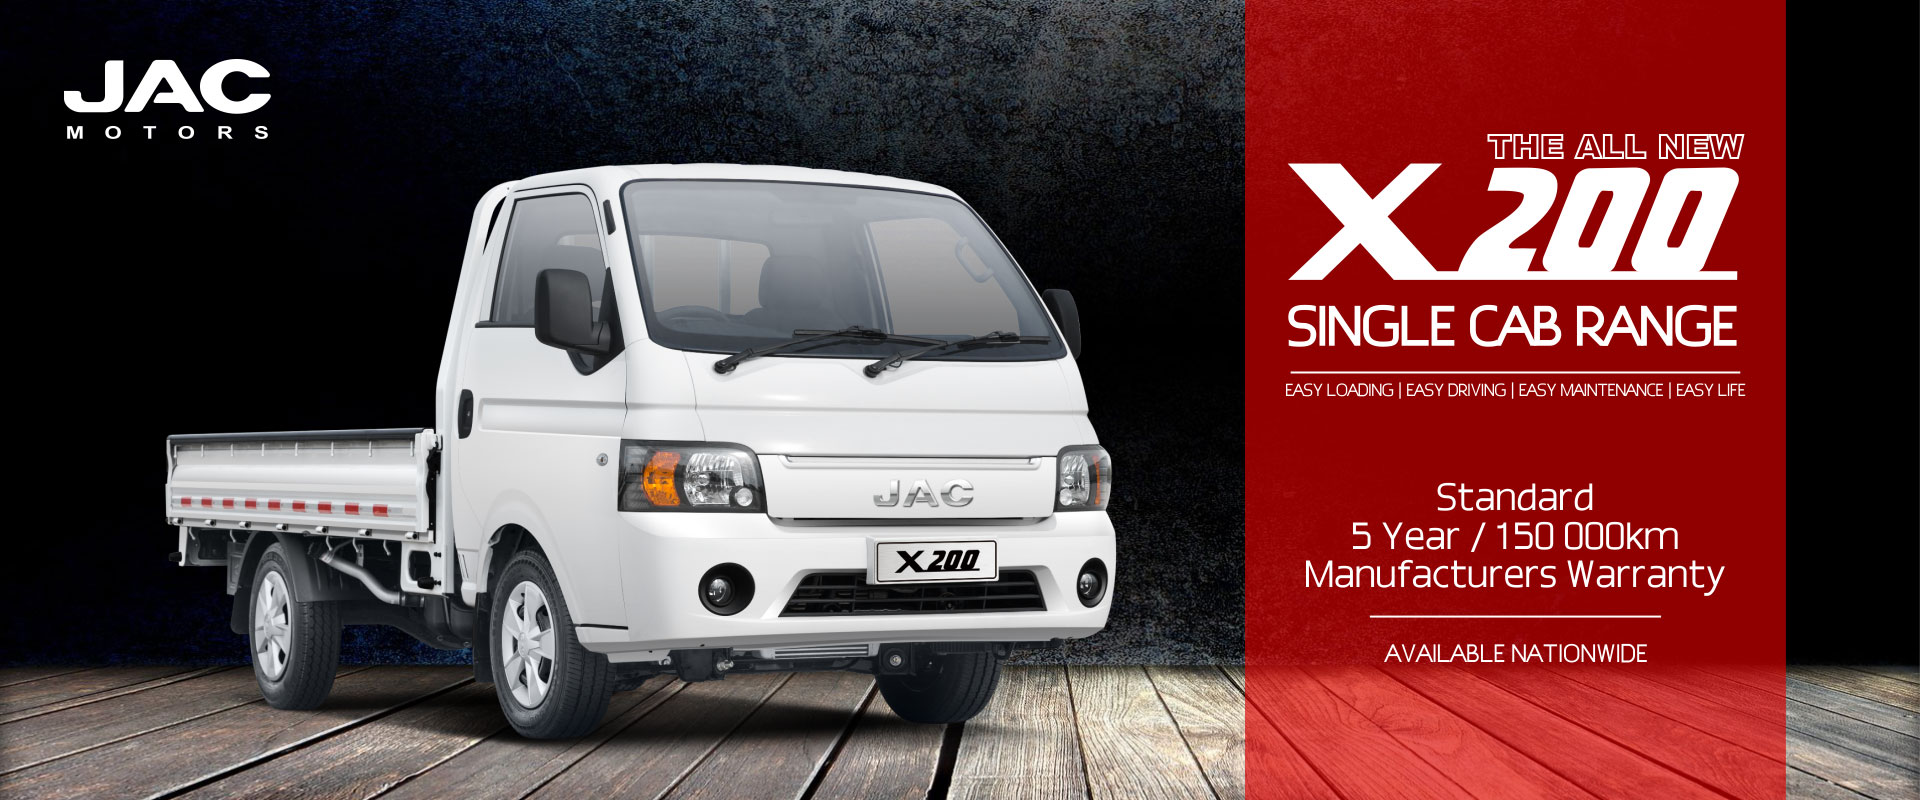 JAC X200 Single Cab